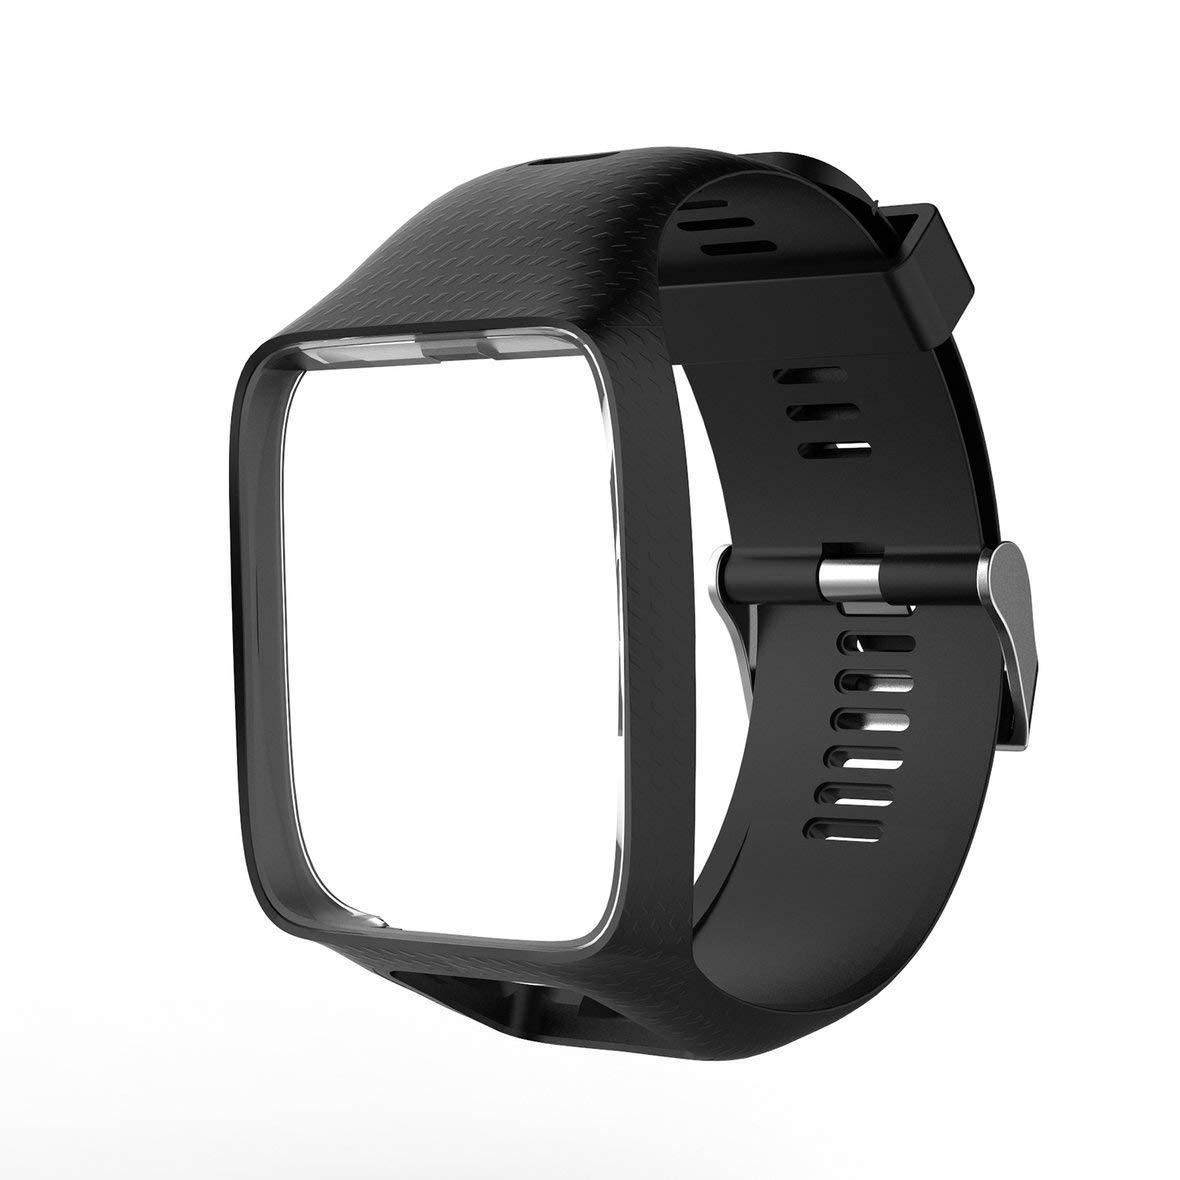 Heaviesk Bracelet de Montre pour Tom Tom 2 s/érie 3 Bracelet de Montre Bracelet de Remplacement en Silicone Bracelet pour Montre Tomtom Runner 2 3 GPS